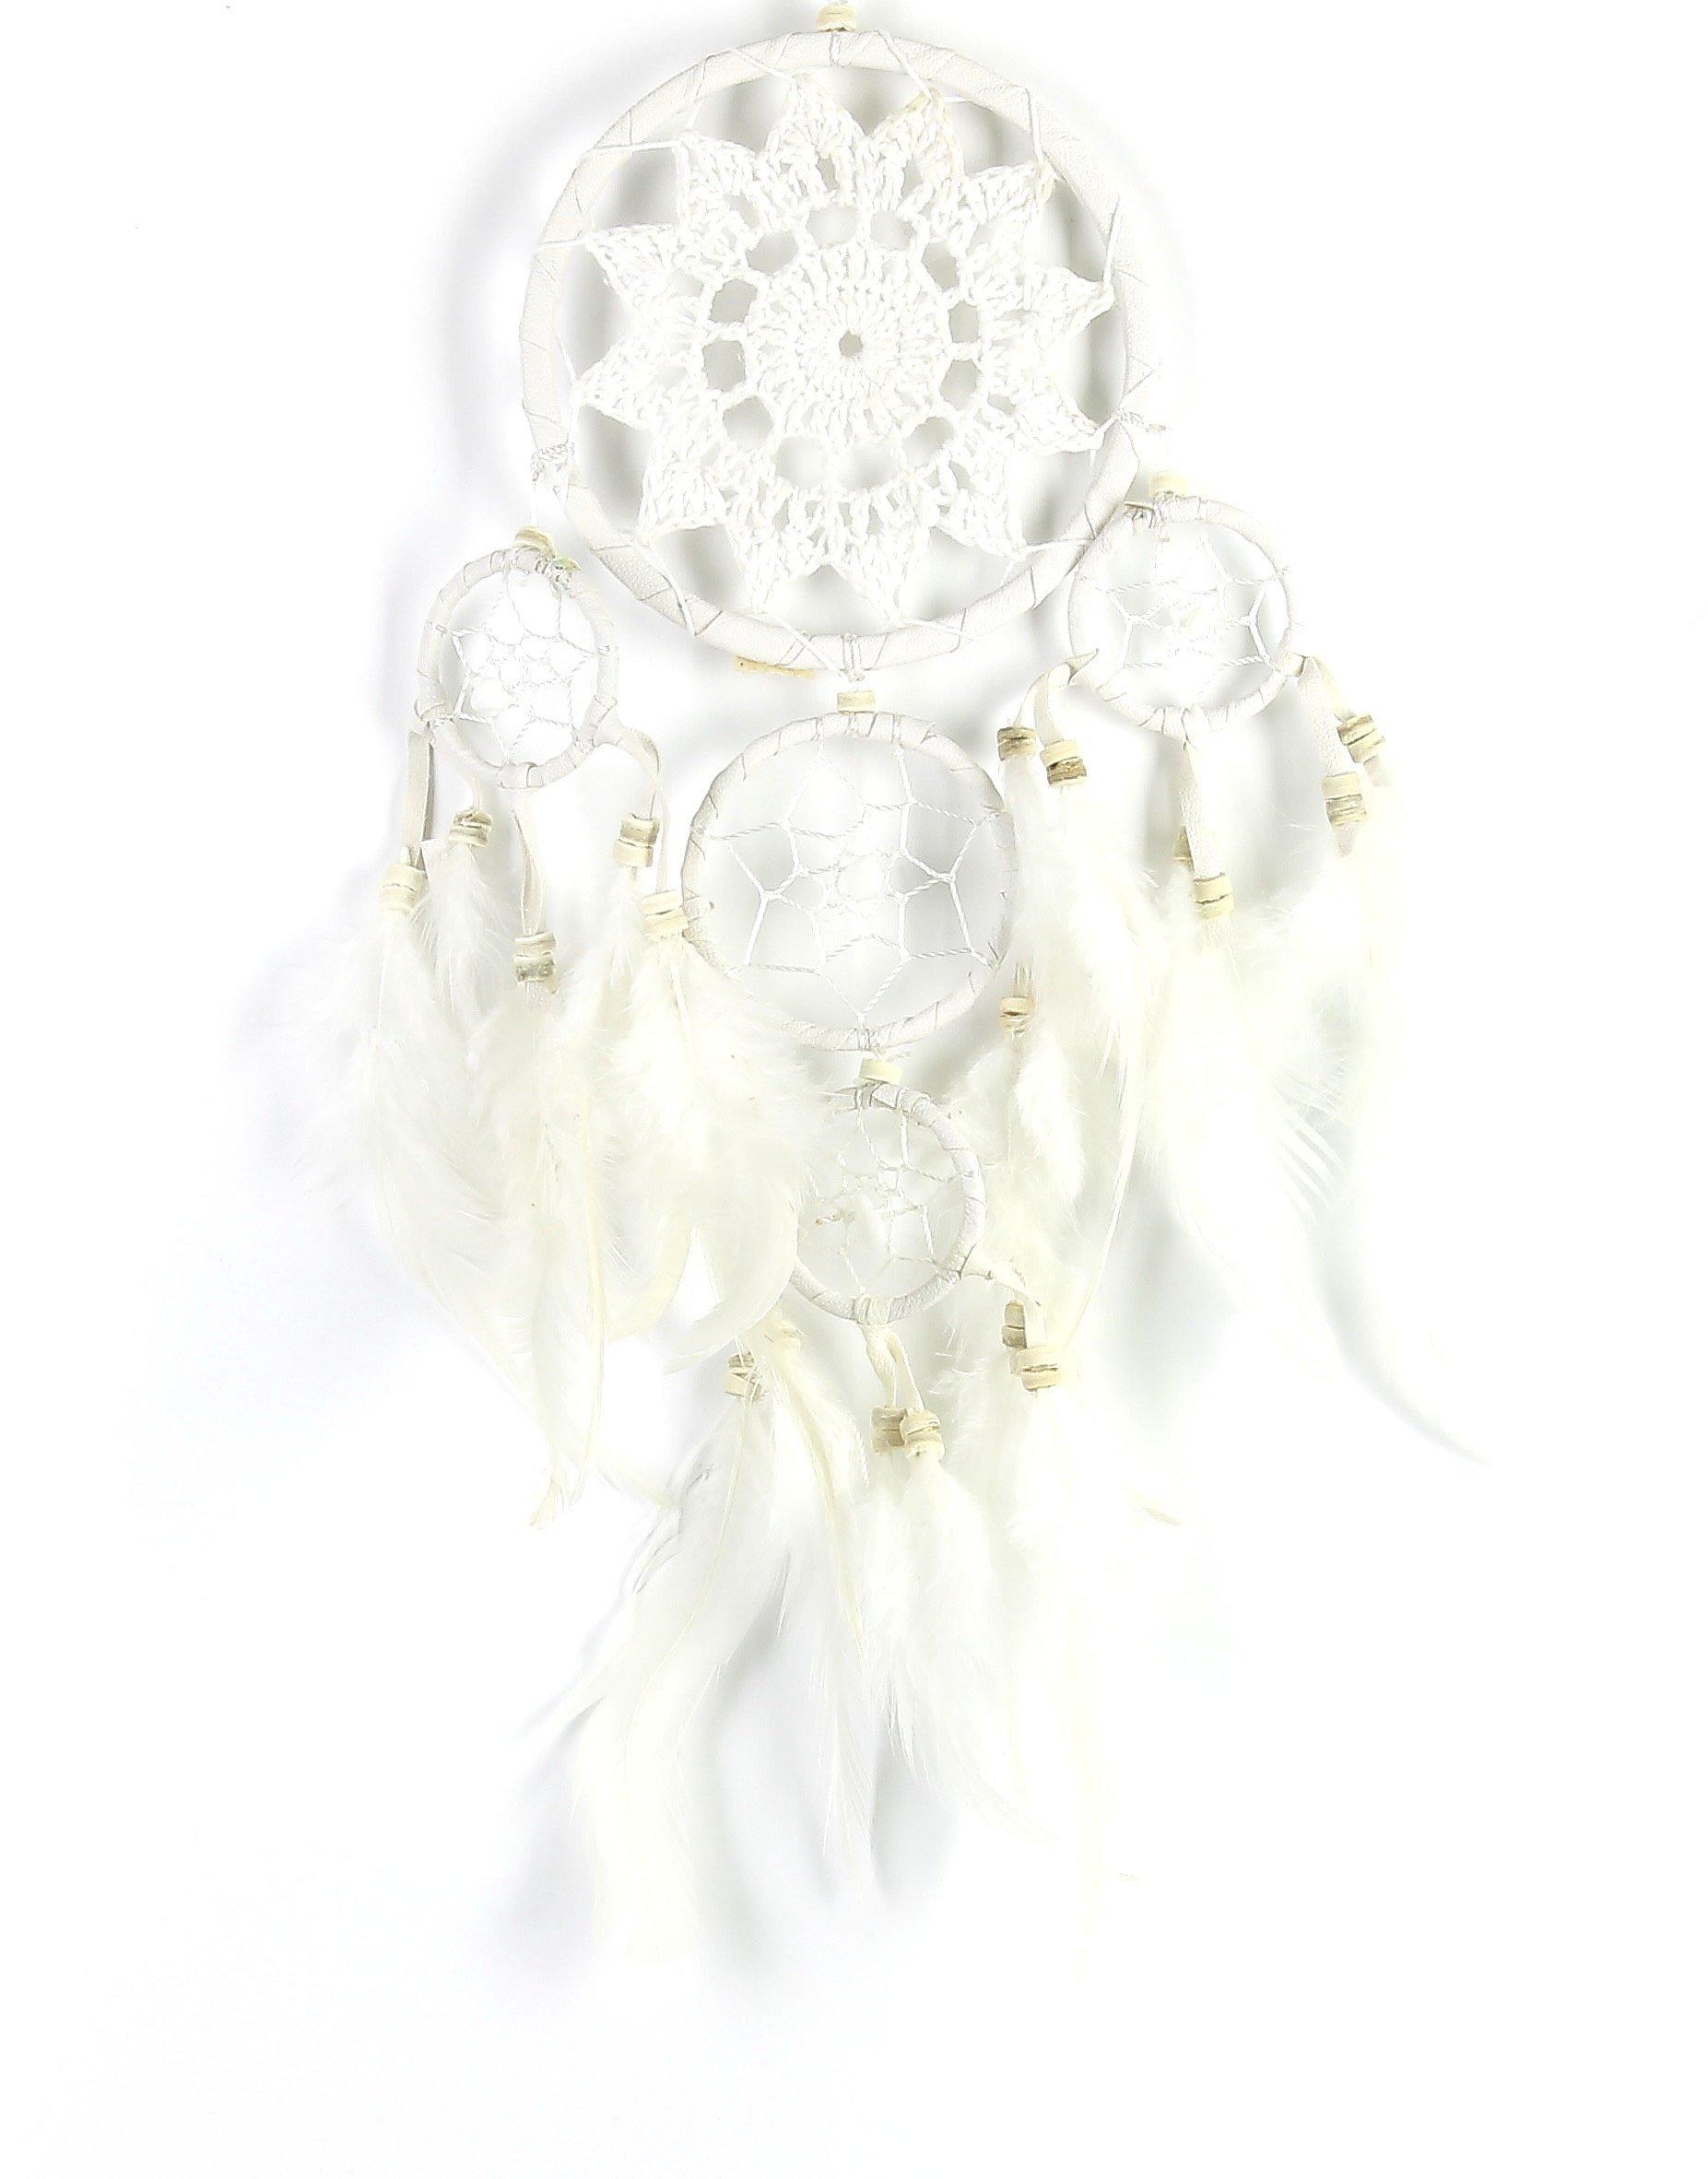 Boheme Dreamcatcher, Crochet Dreamcatcher, Wall Hanging, Home Decor, Spiritual, Meditation, Boho, Bohemian, Gypsy, Feathers